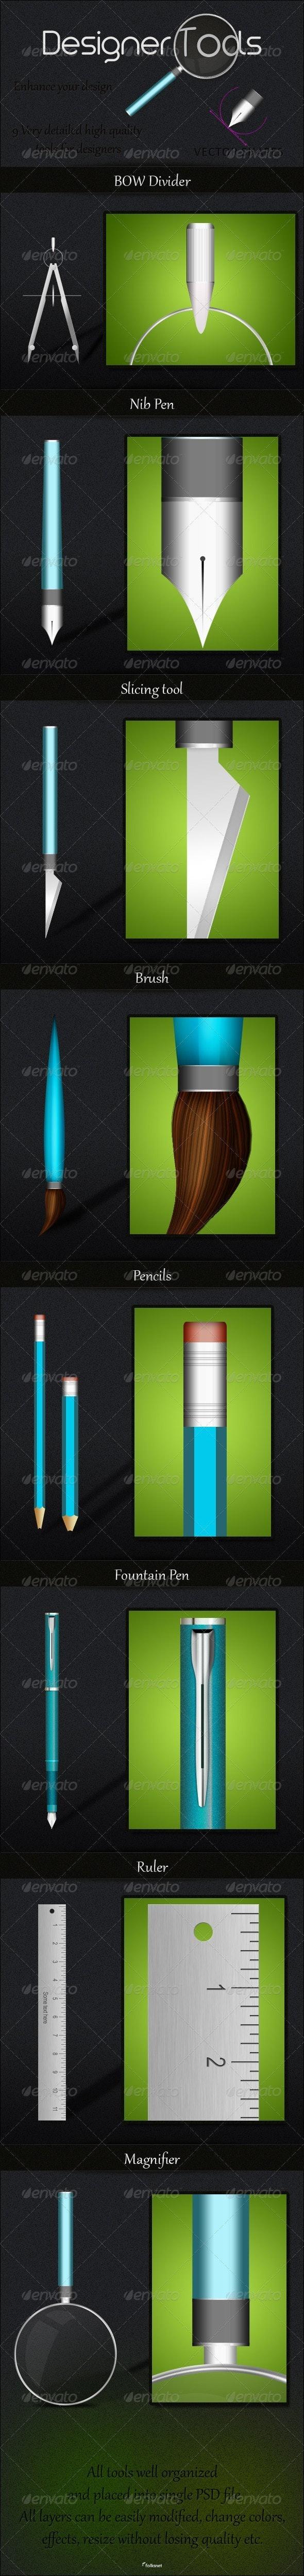 Designer Tools - Miscellaneous Graphics